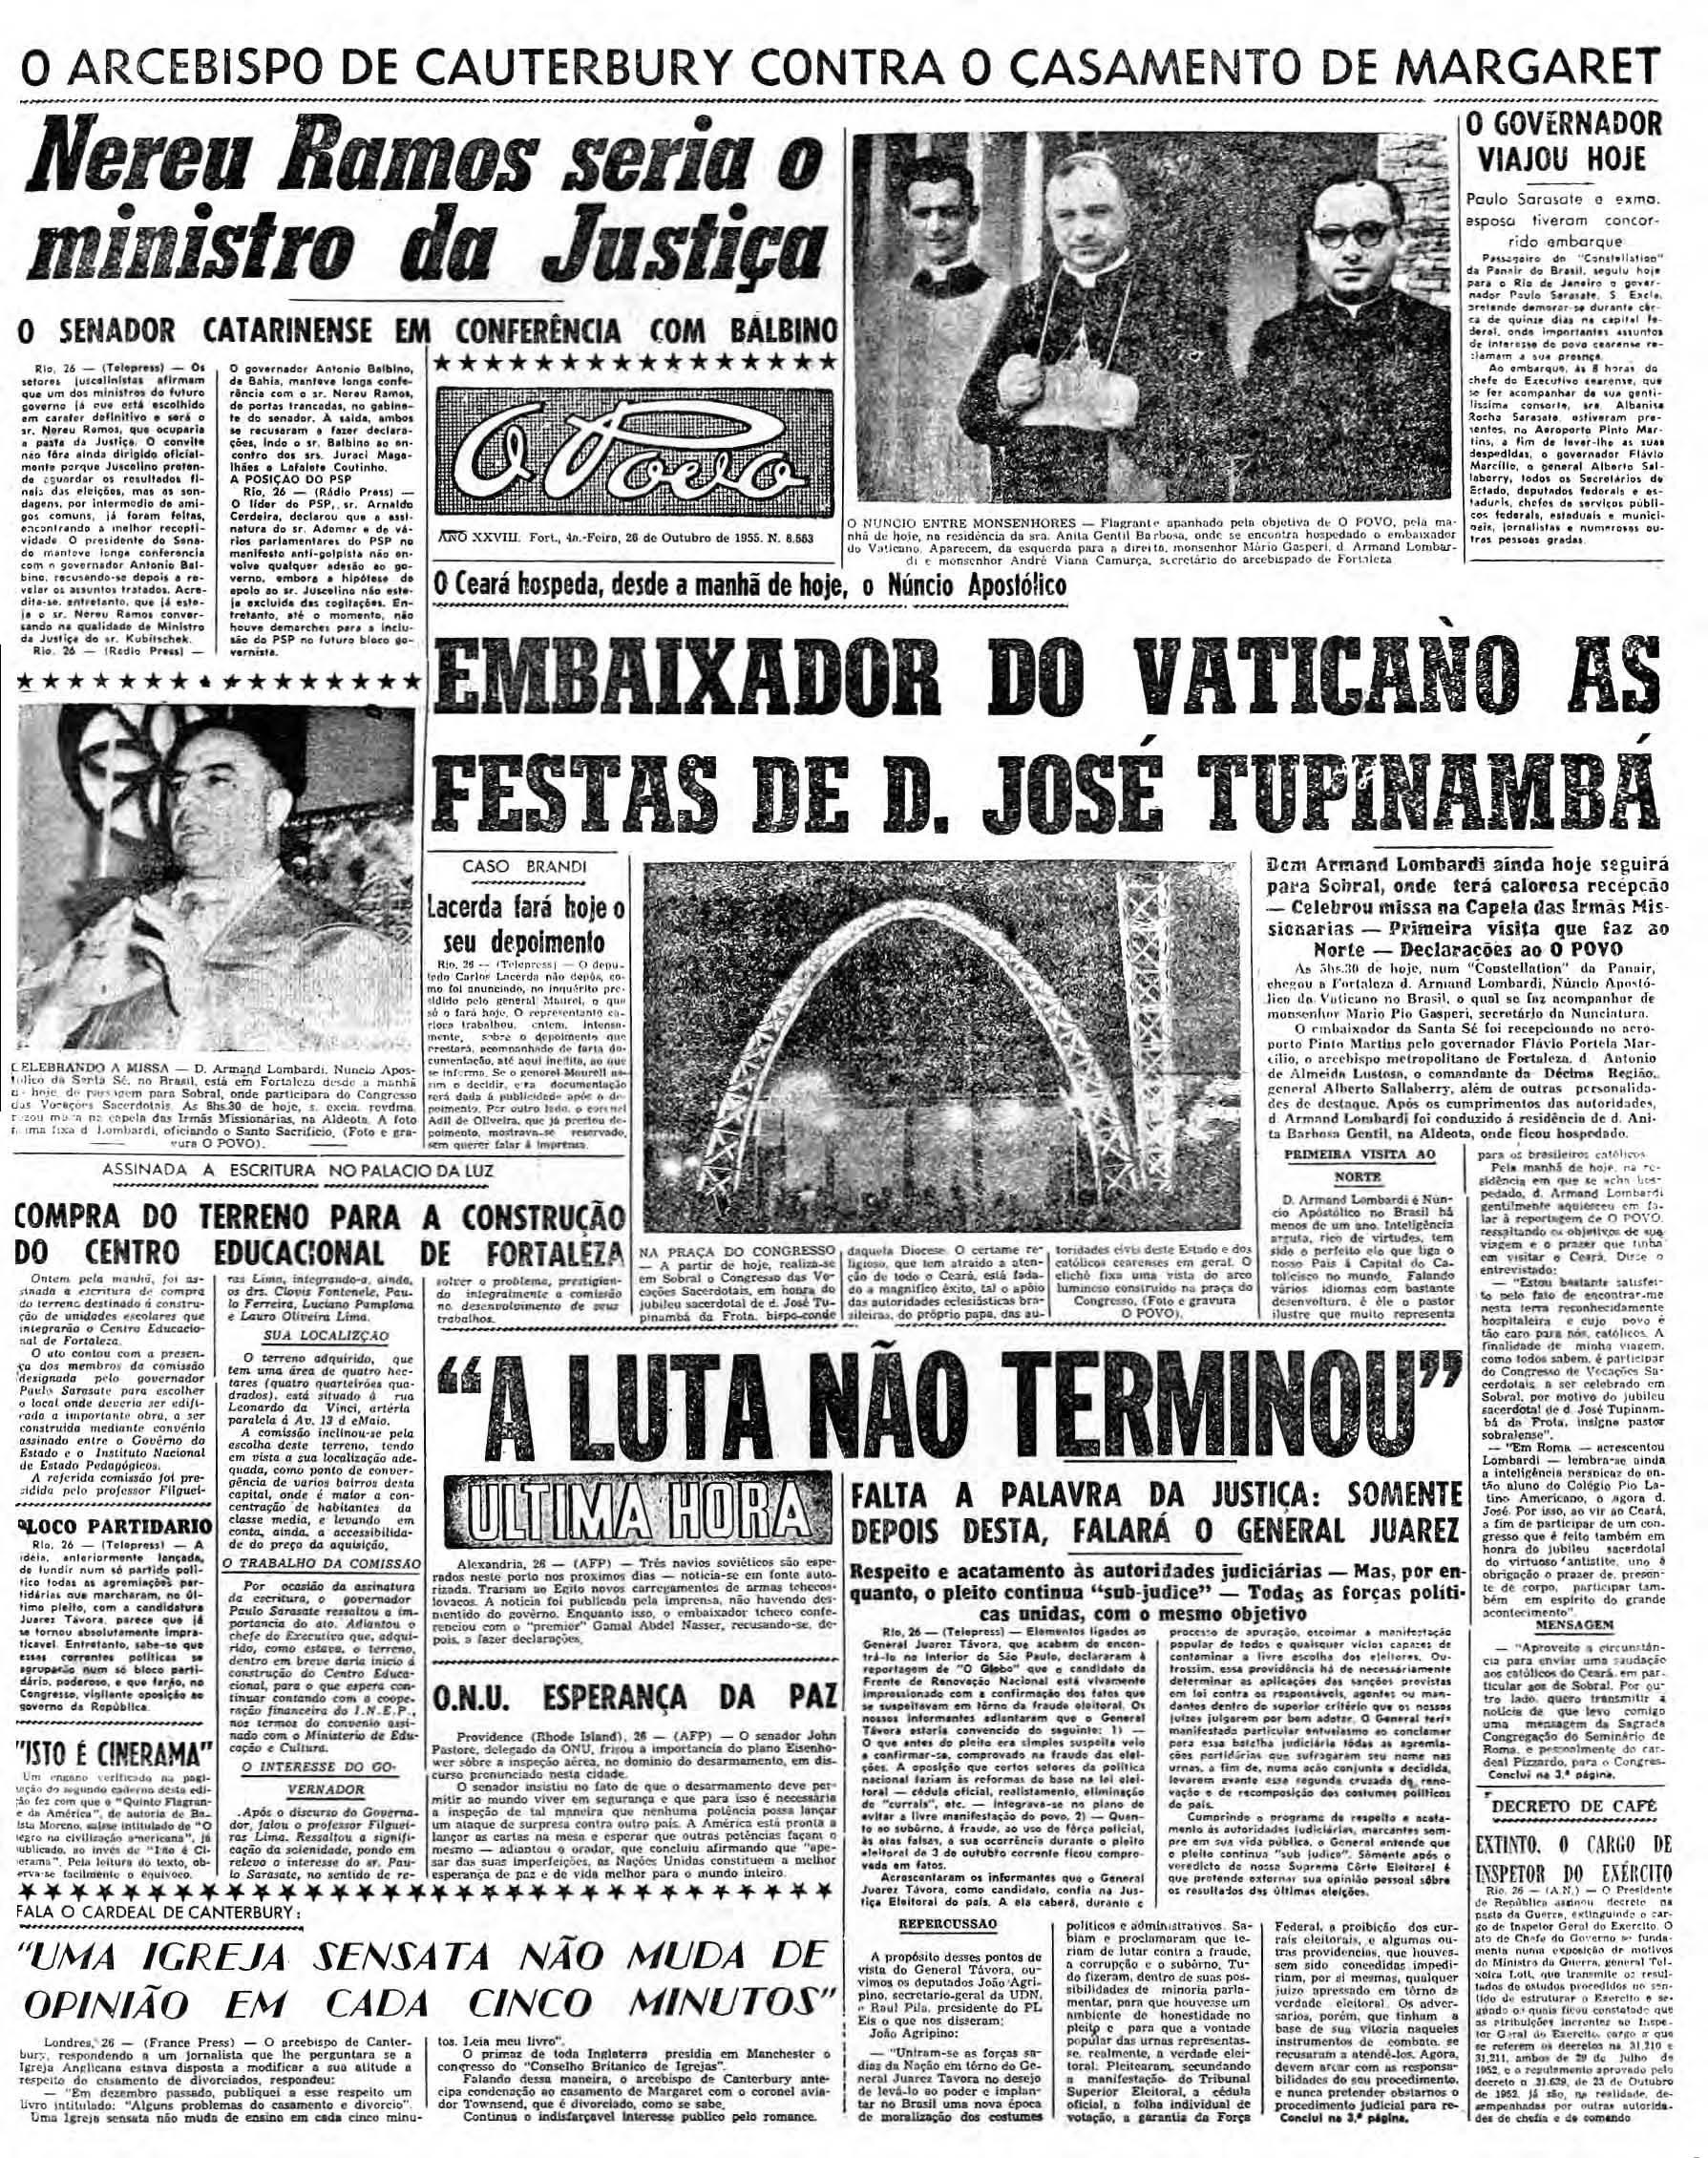 26-10-1955